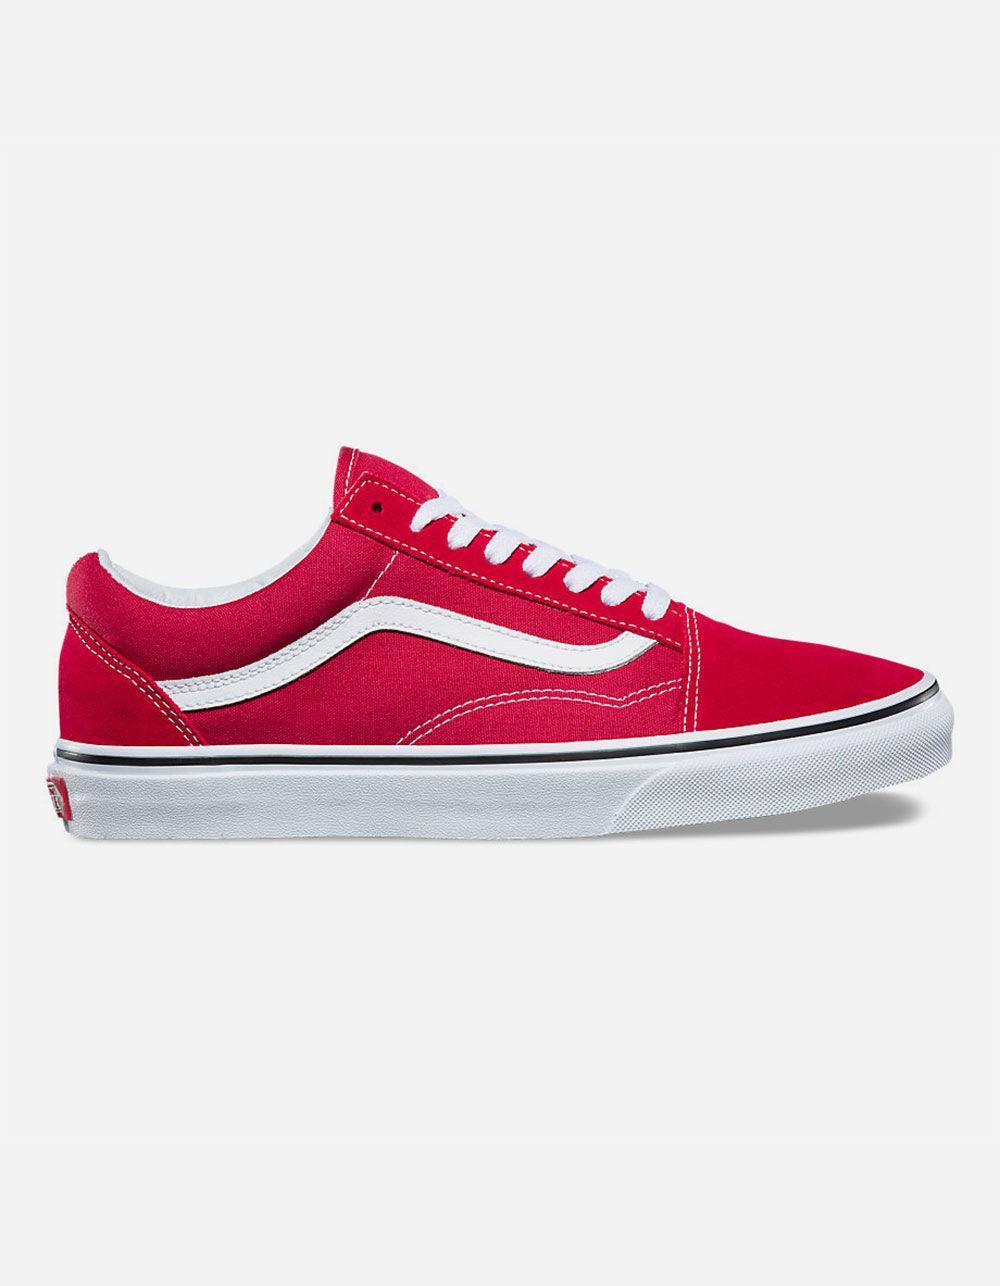 ba34c273511 Lyst - Vans Old Skool Crimson   True White Shoes in Red for Men